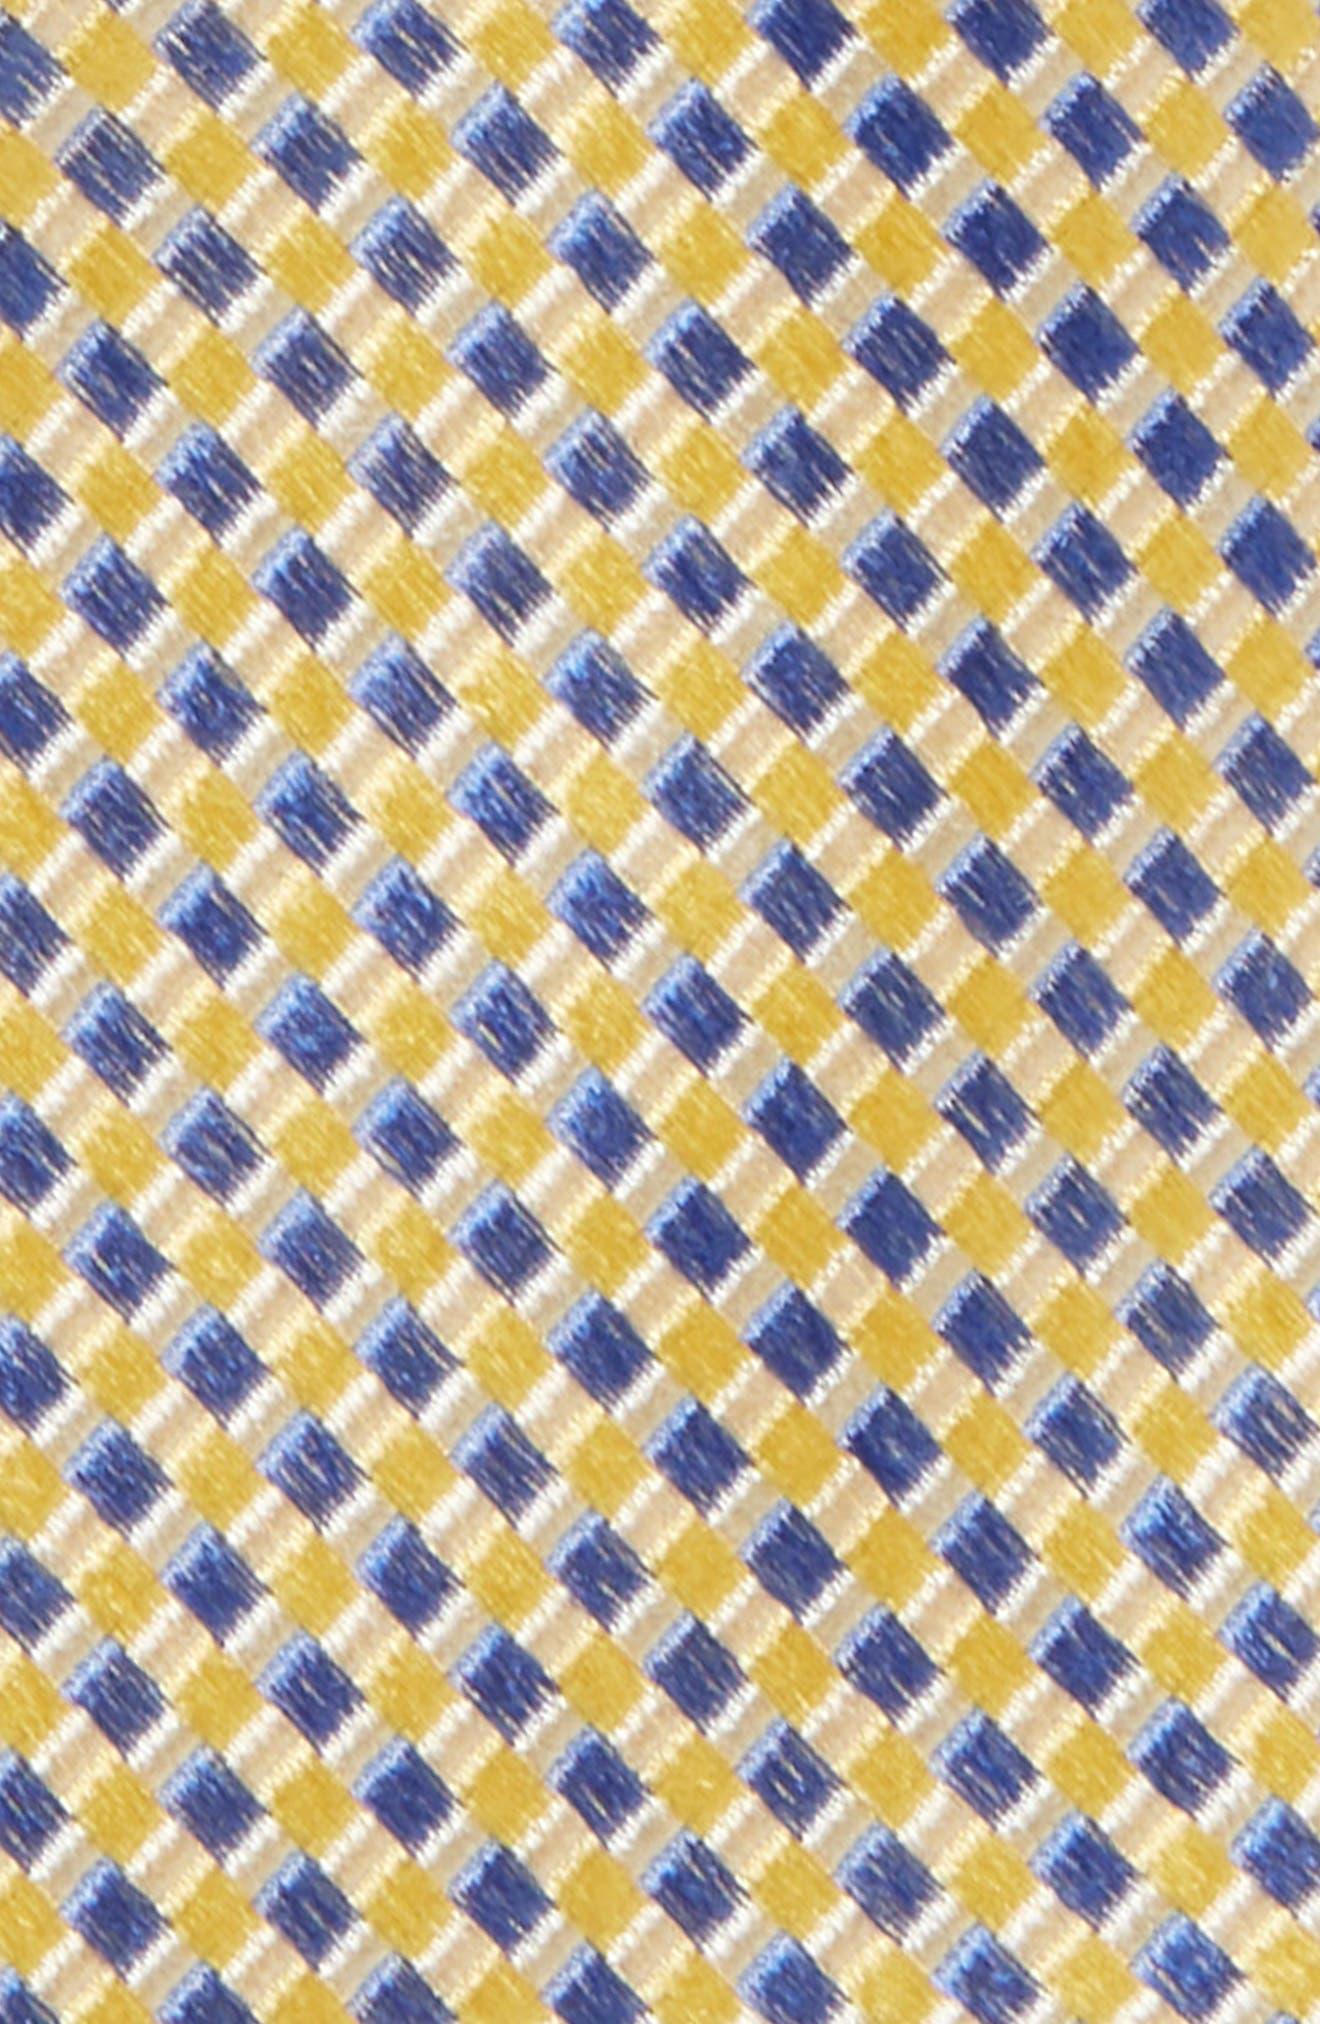 MICHAEL KORS,                             Check Silk Tie,                             Alternate thumbnail 2, color,                             YELLOW